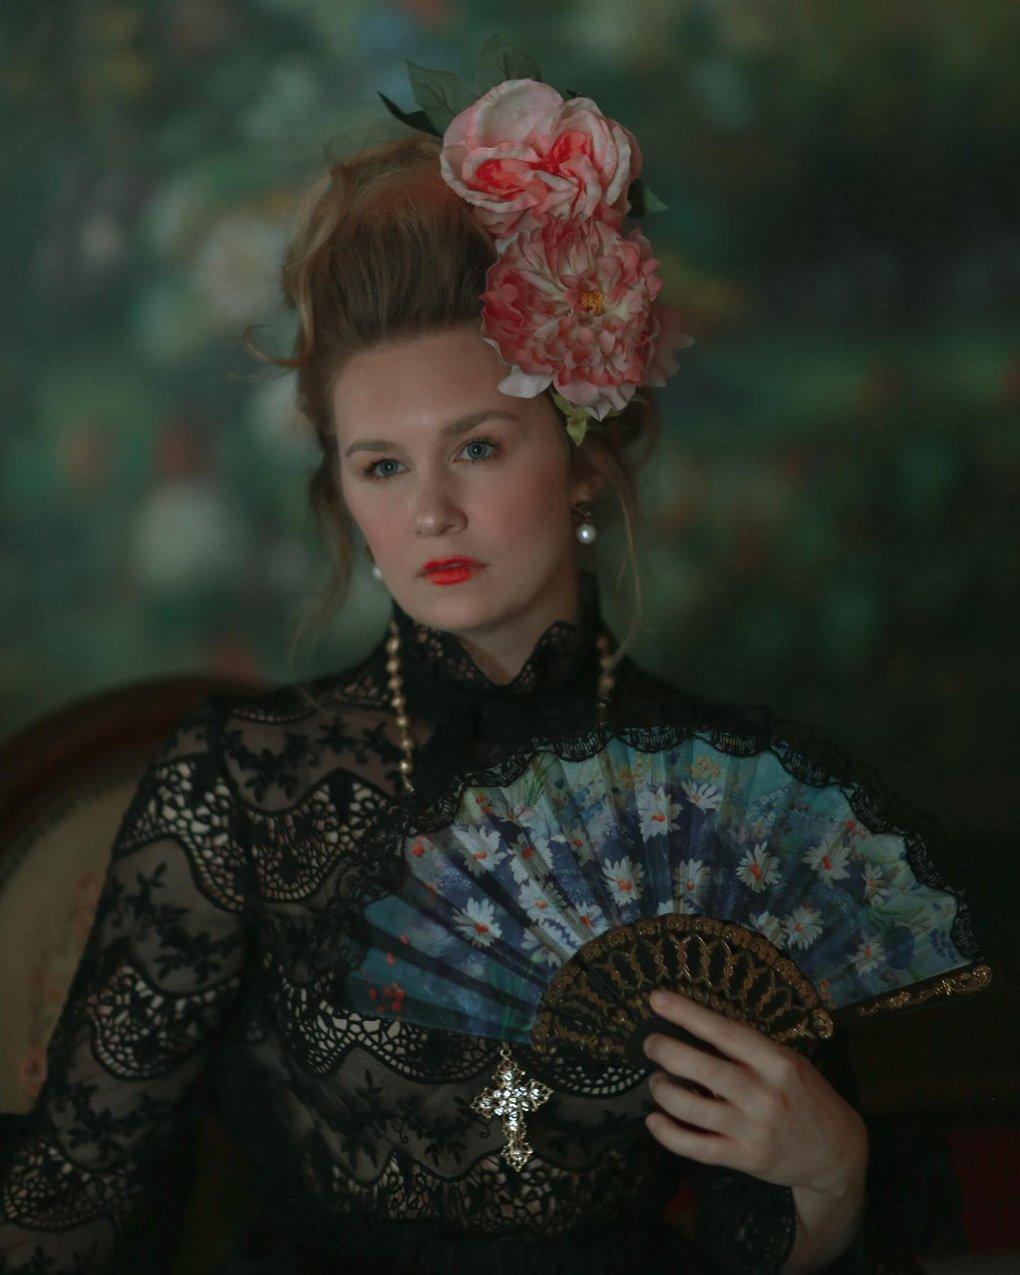 malorie-mackey-katarina-van-derham-spanish-renaissance-photo